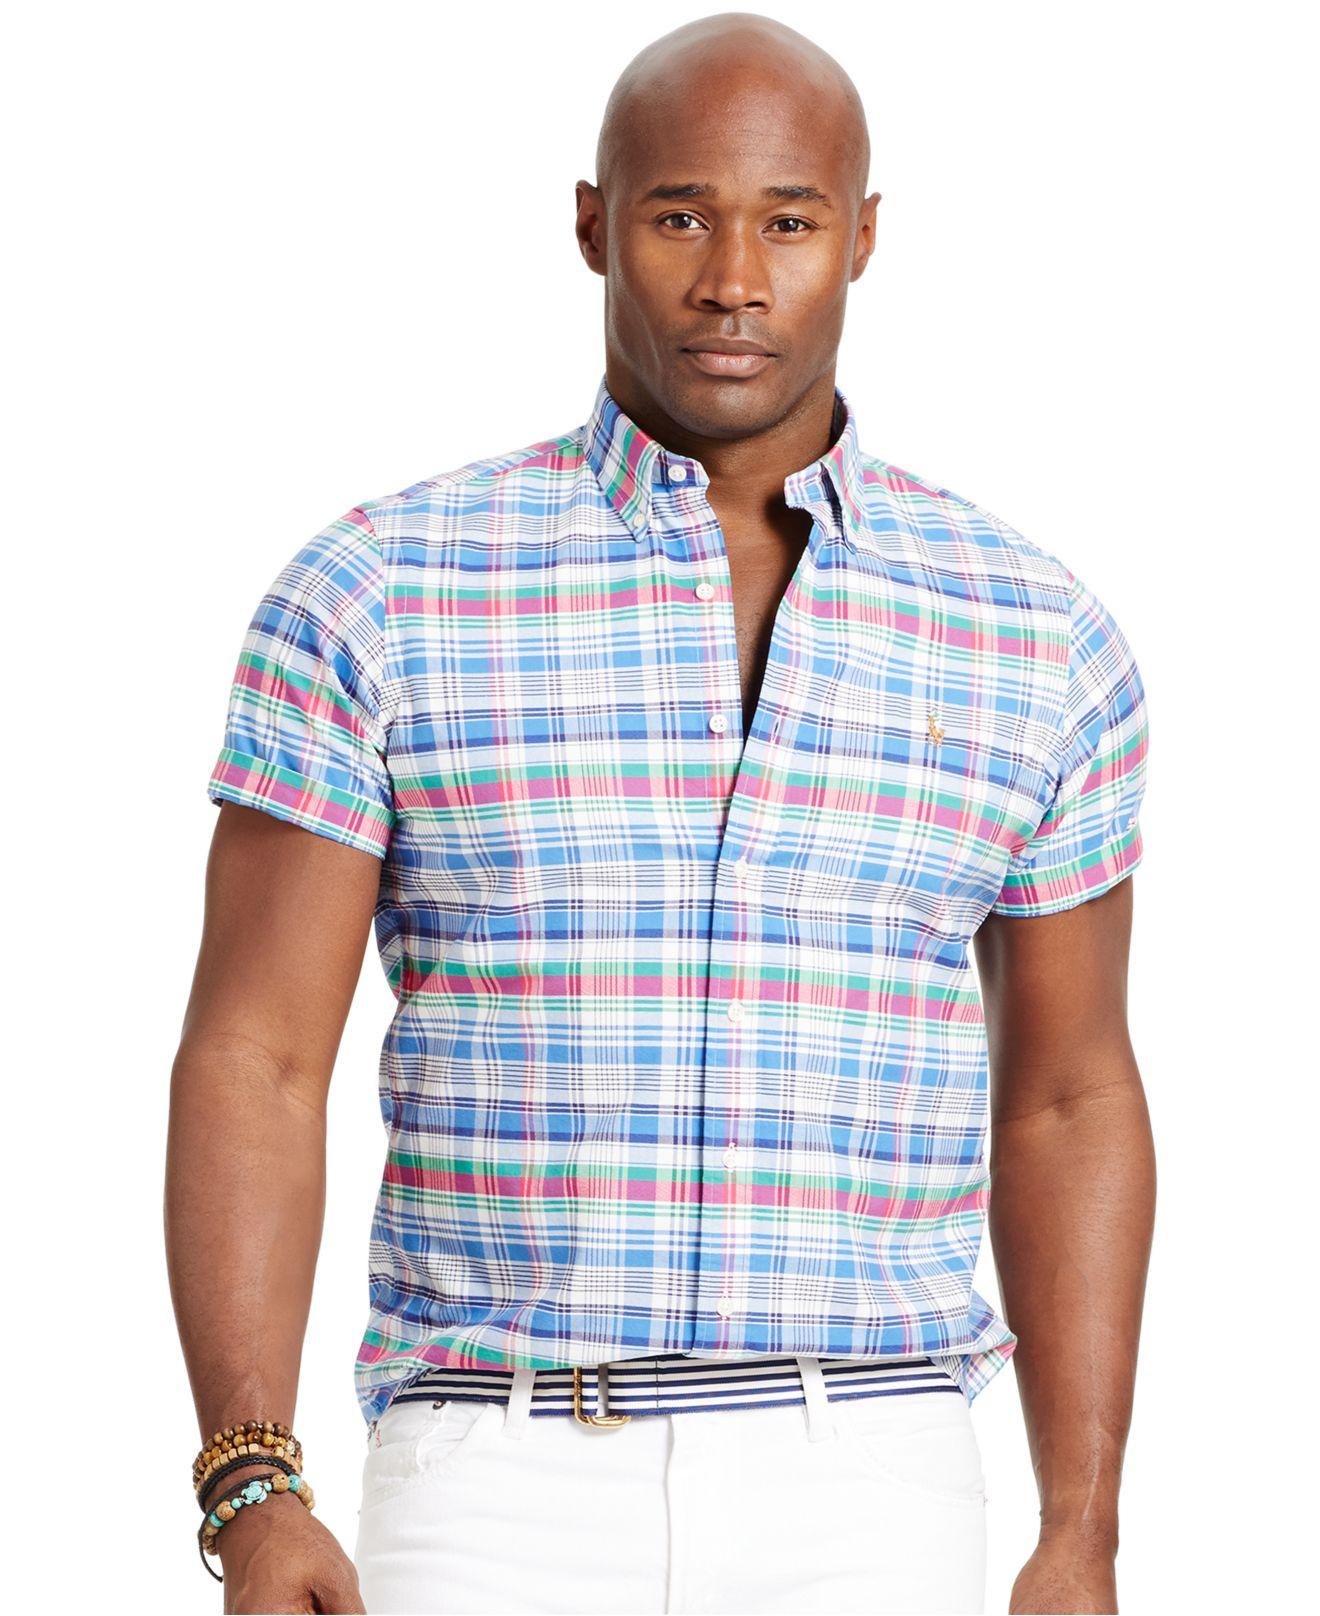 5c94bc105 Polo Short Sleeve Oxford Shirts - DREAMWORKS